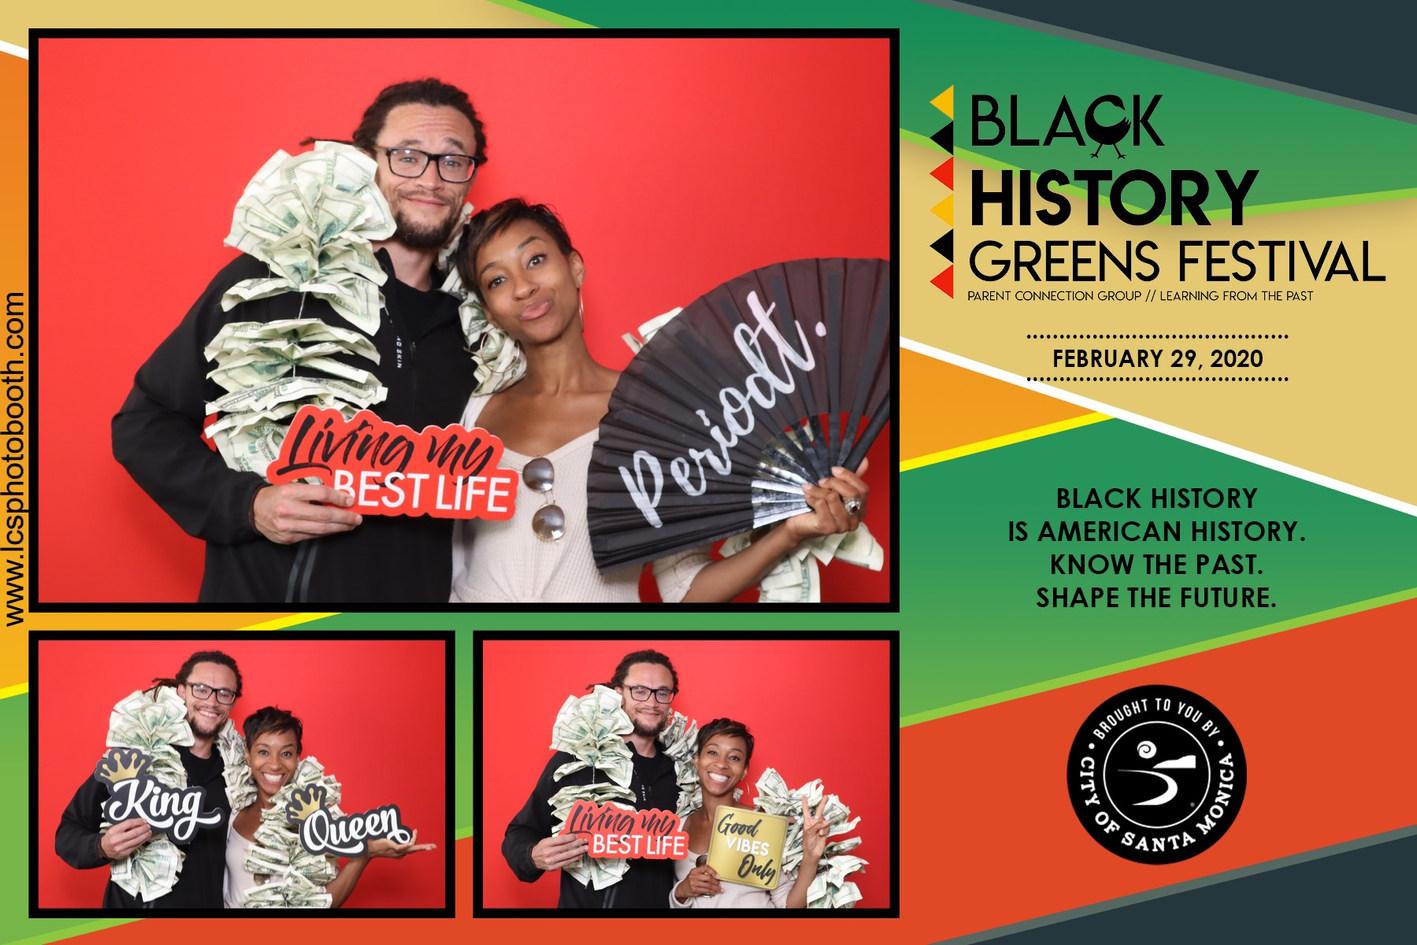 City of Santa Monica, Black History Festival